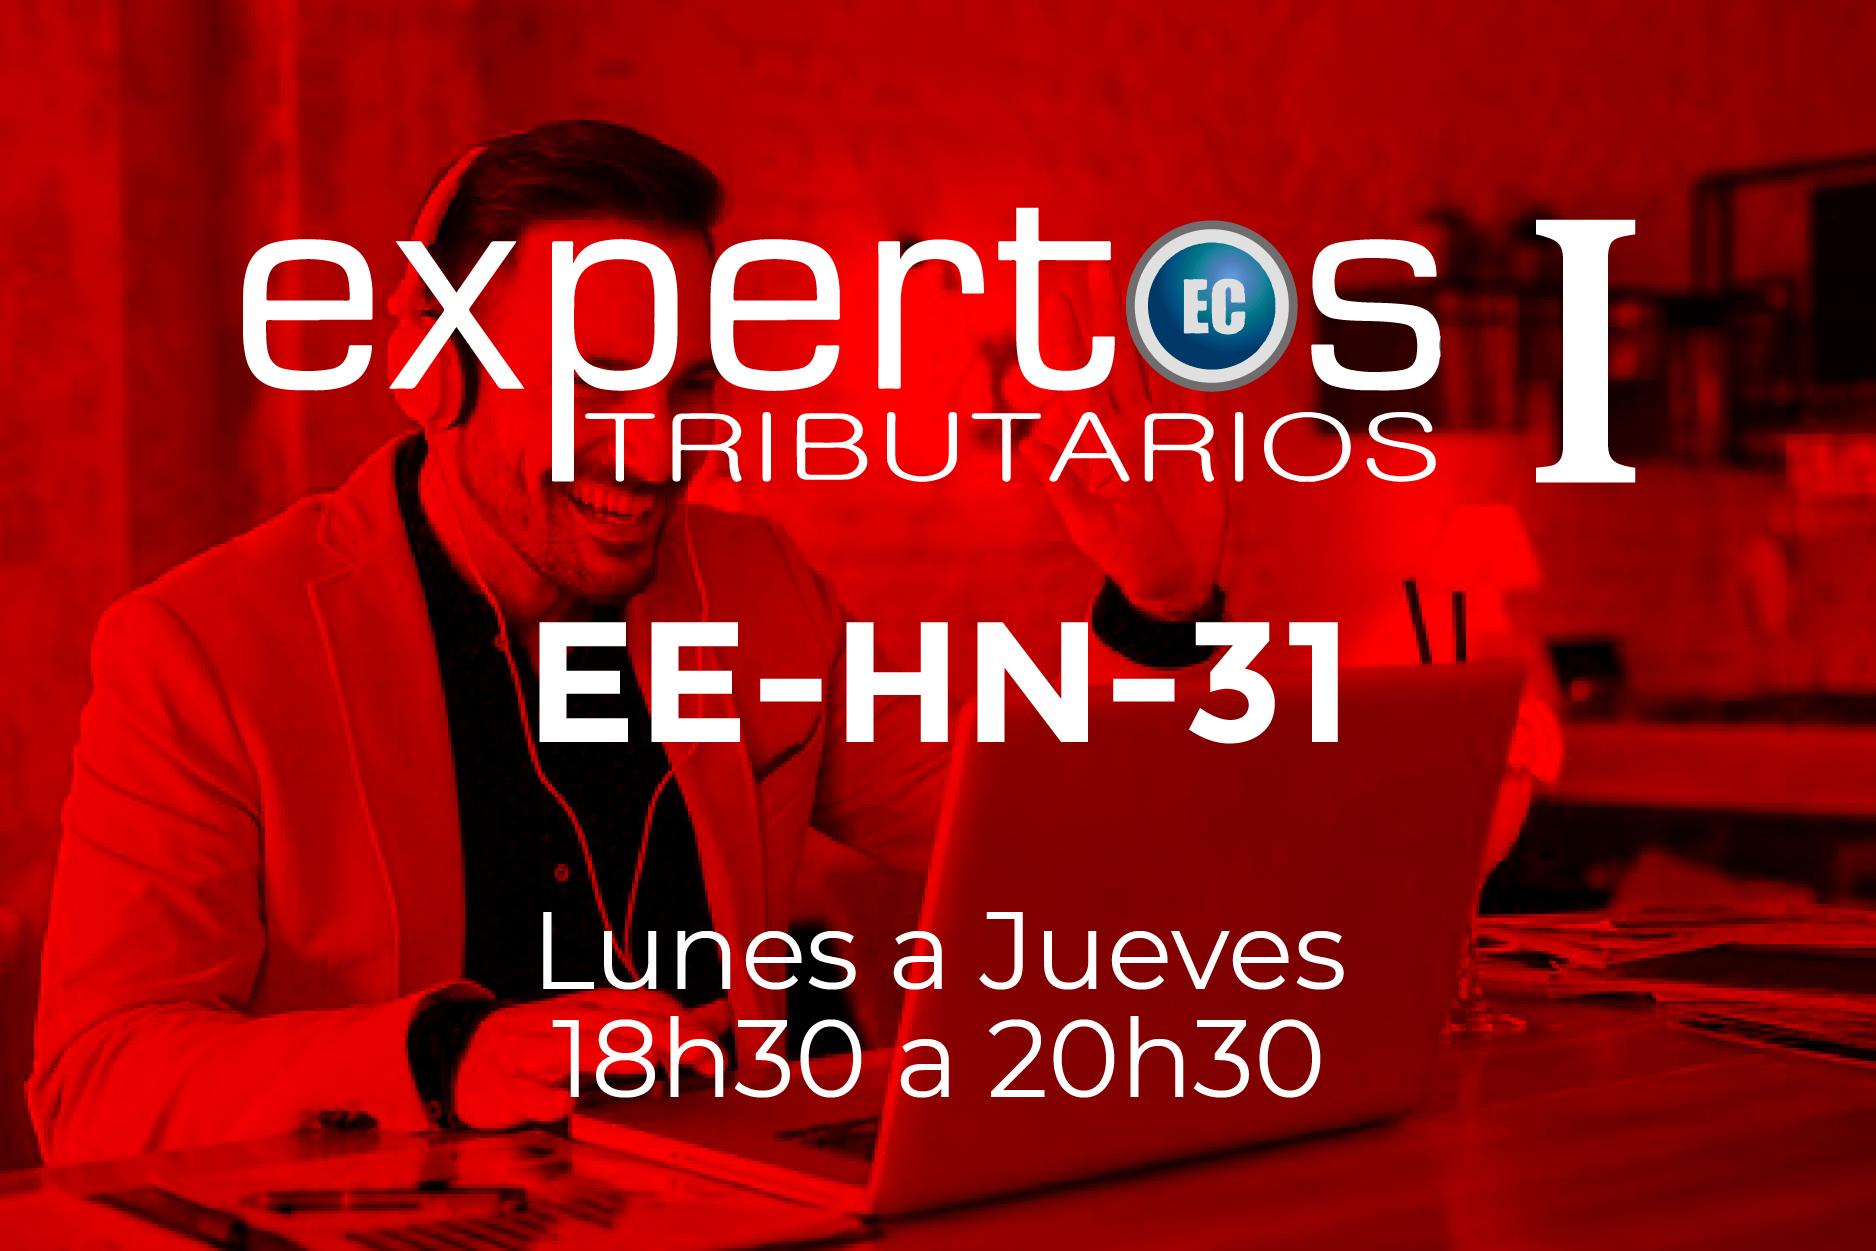 31 - EXPERTOS TRIBUTARIOS - LUNES A JUEVES - 18:00 A 20:30